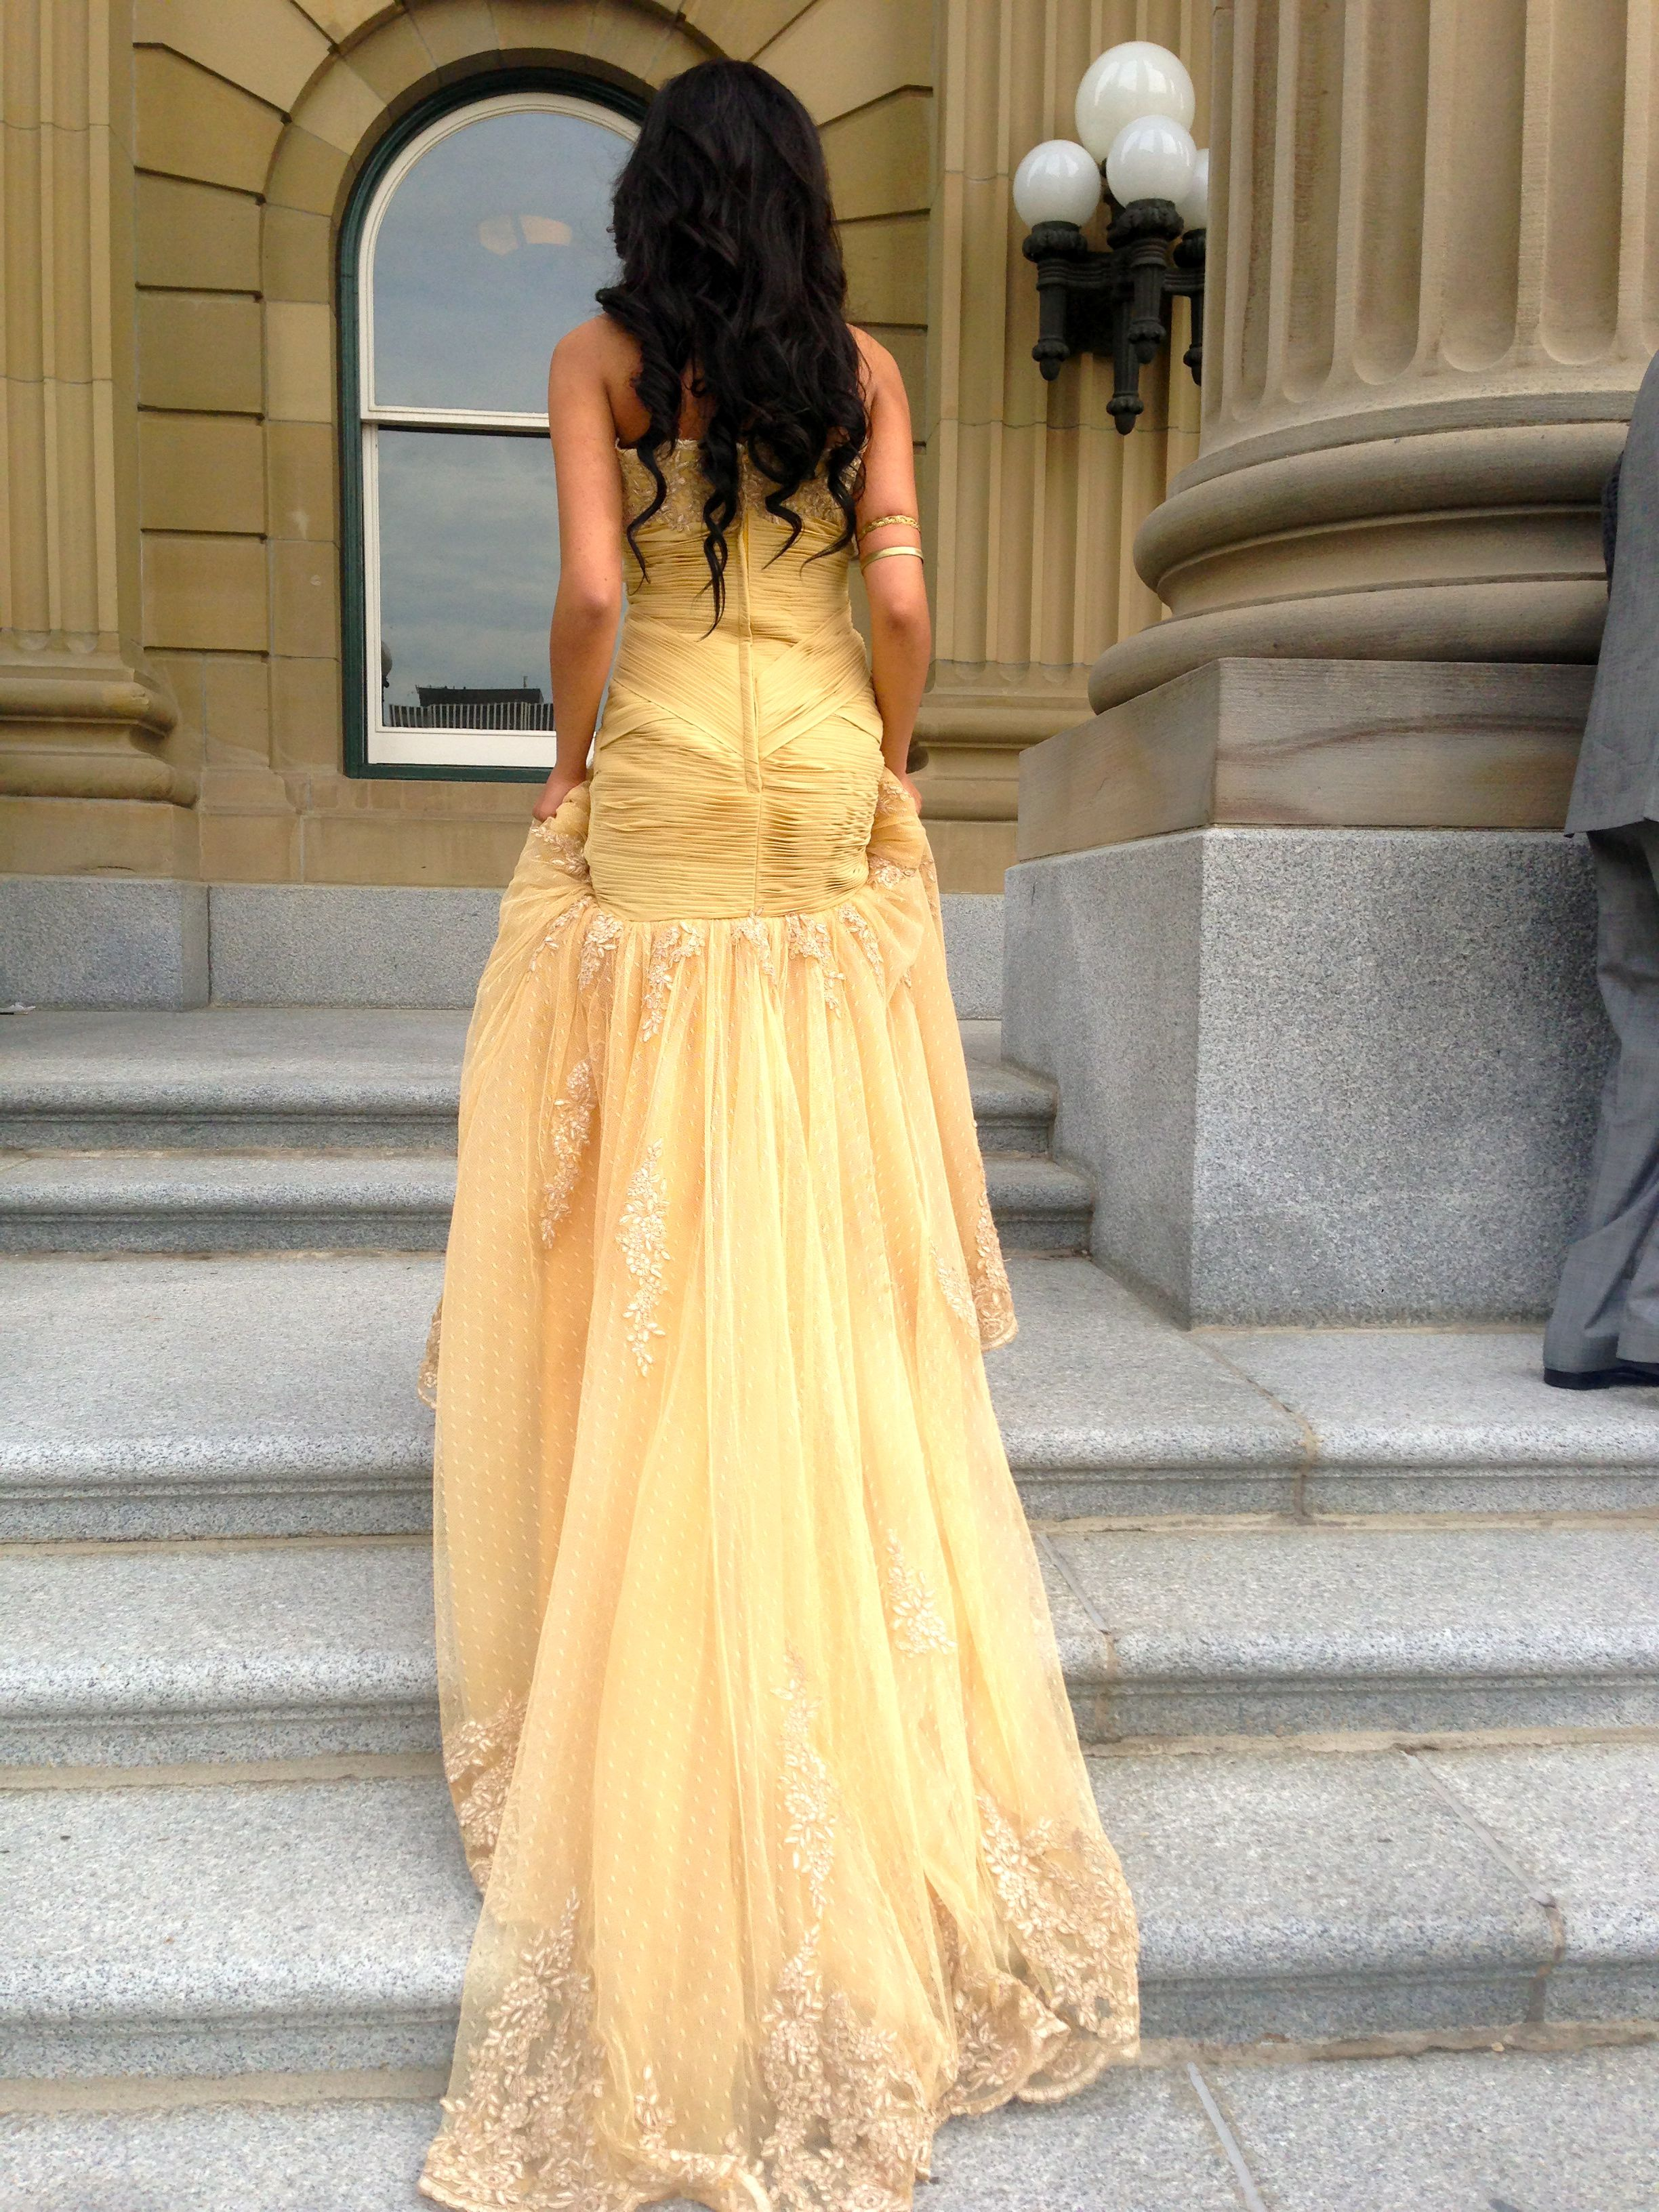 Gold Mermaid Gown Gold Dress Yellow Mermaid Gown Yellow Dress Marc Defang Dress Graduation Gown Gradu Gowns Dresses Gold Prom Dresses Gold Prom Dress Mermaid [ 3264 x 2448 Pixel ]